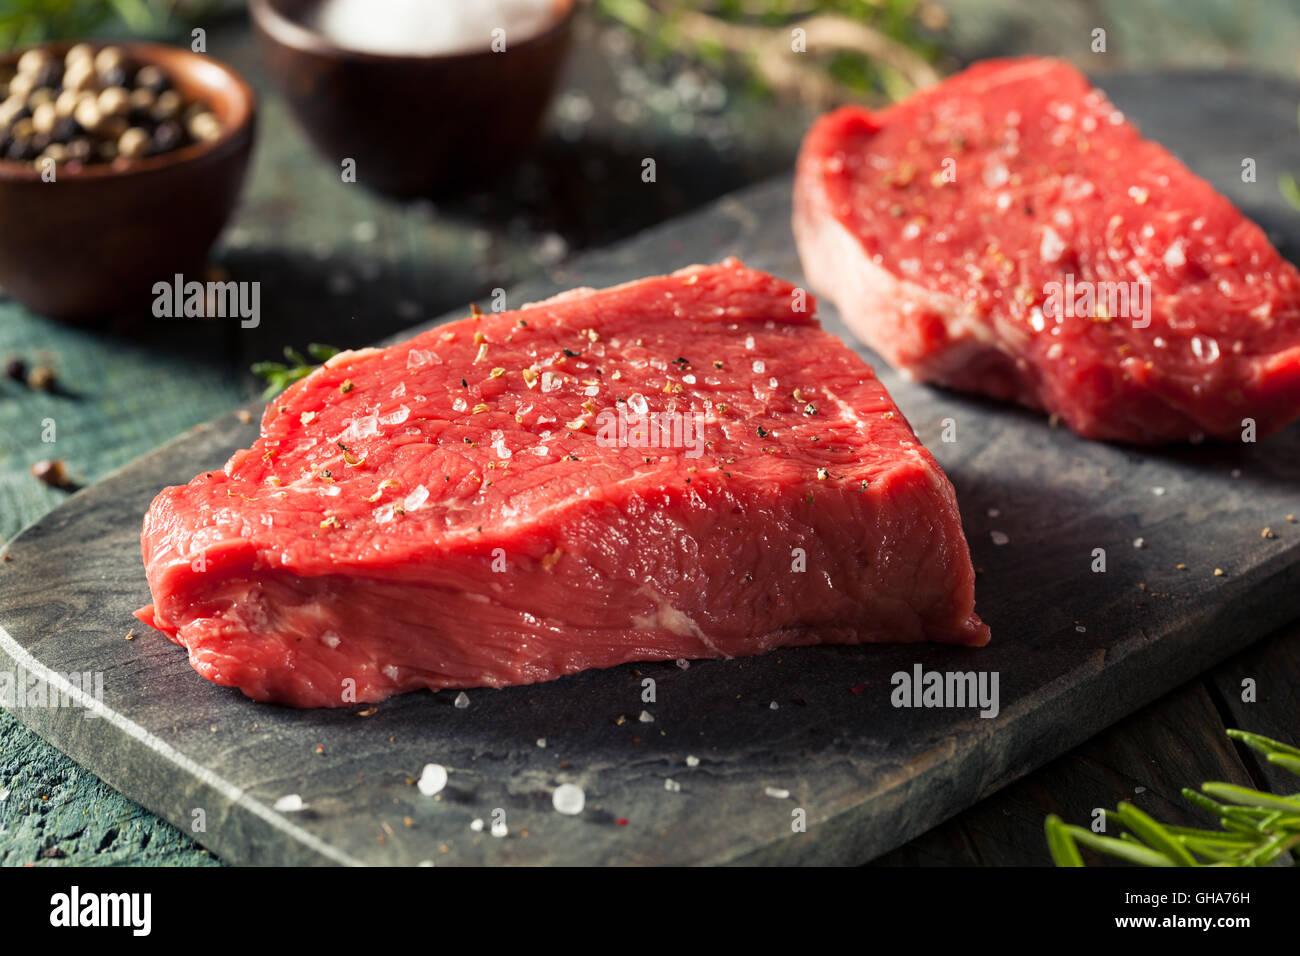 Raw Organic Grass Fed Sirloin Steak with Salt and Pepper - Stock Image